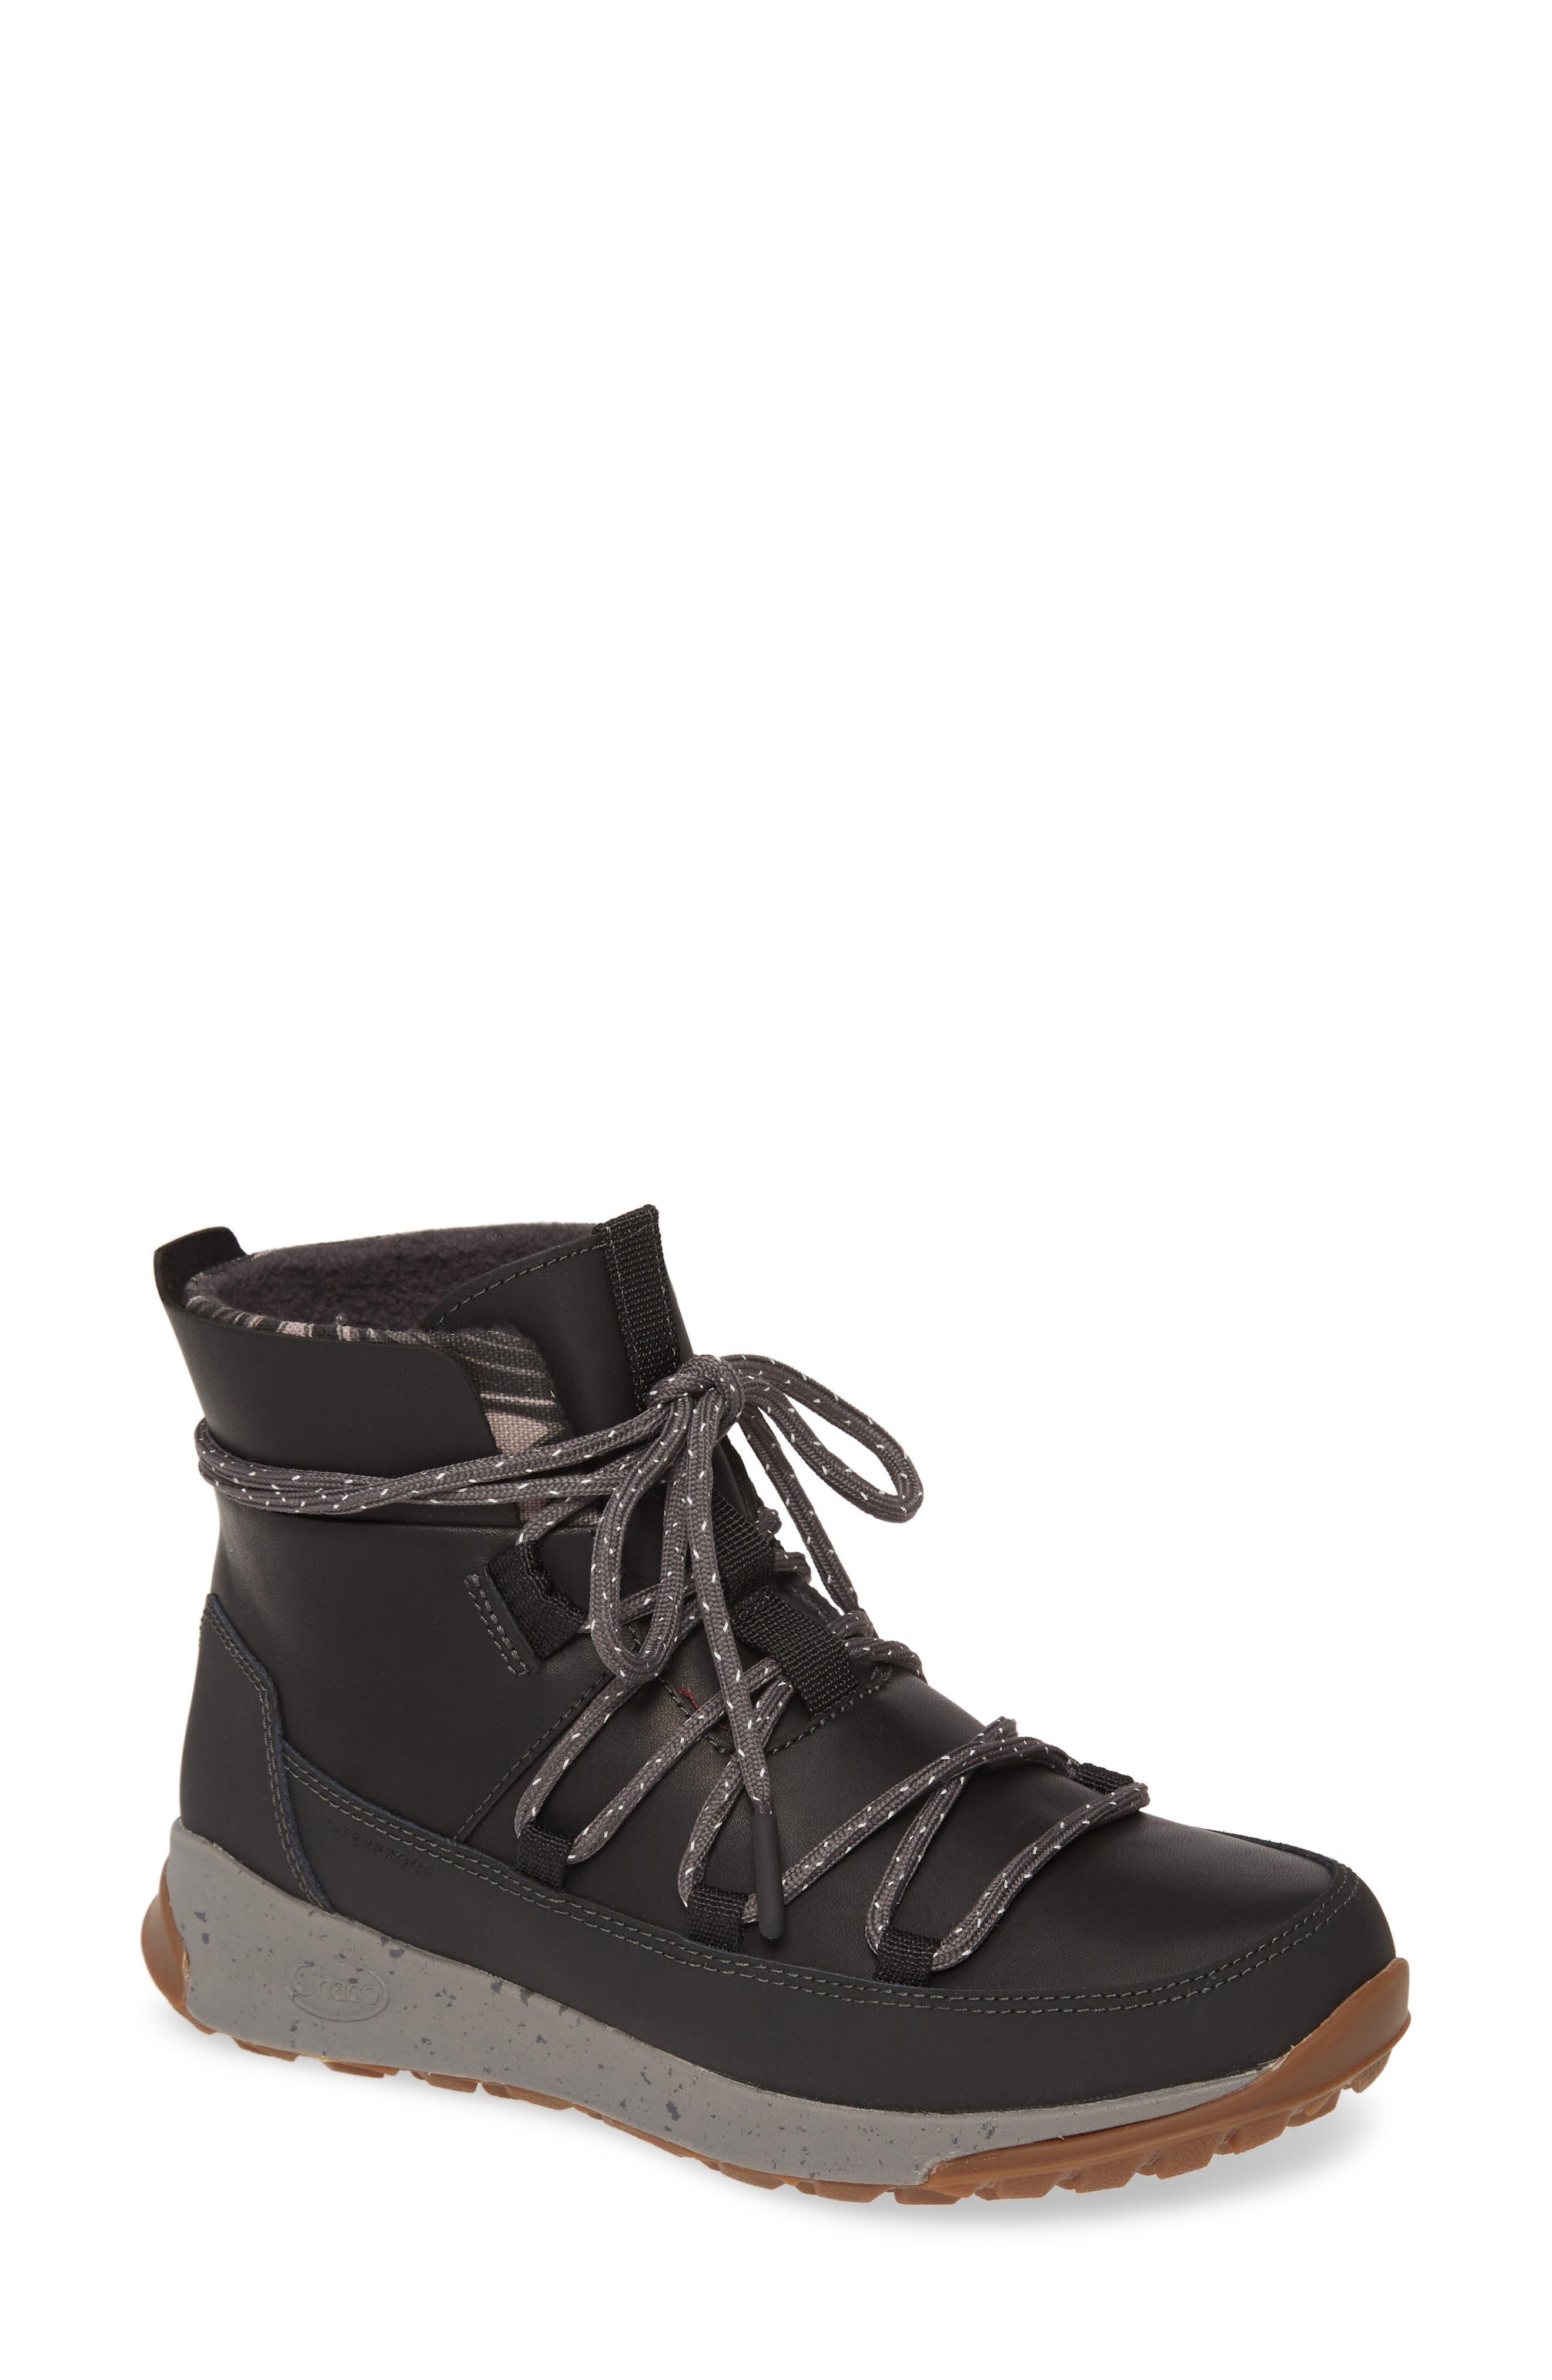 Borealis Peak Waterproof Lace-Up Boot